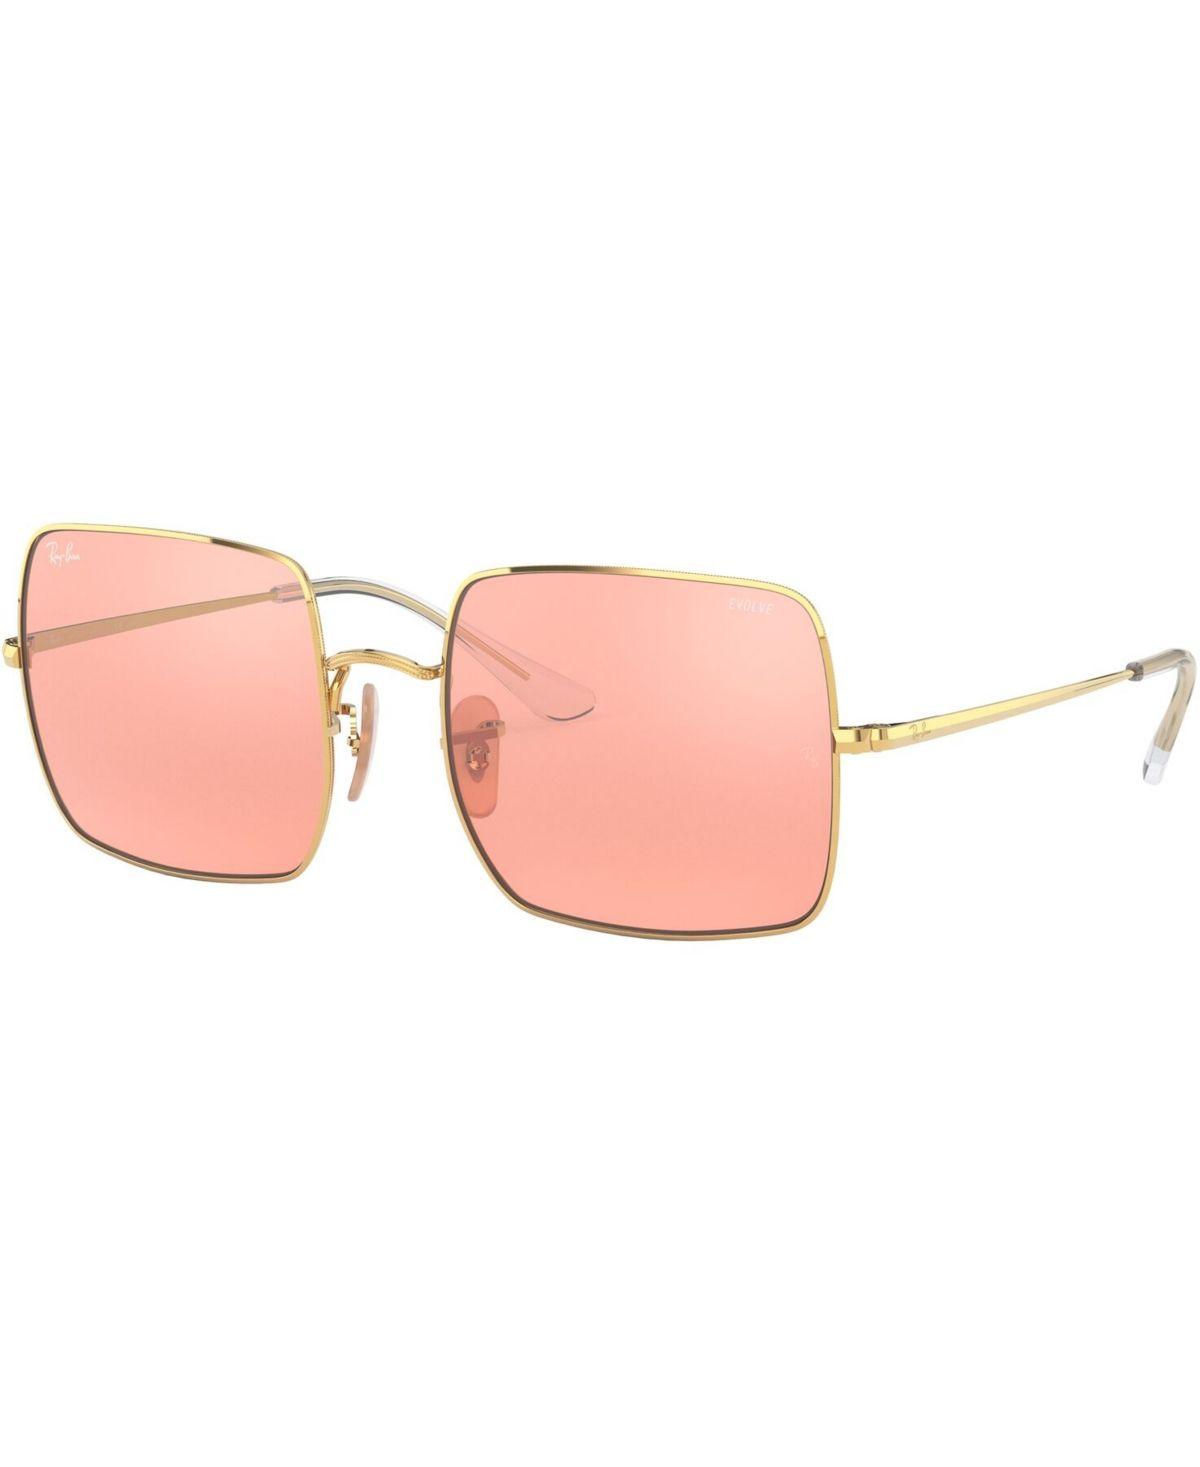 Ray Ban Sunglasses Rb197154 Hzp Shiny Gold Photo Pink Mirror Grey Rectangle Sunglasses Rectangular Sunglasses Sunglasses